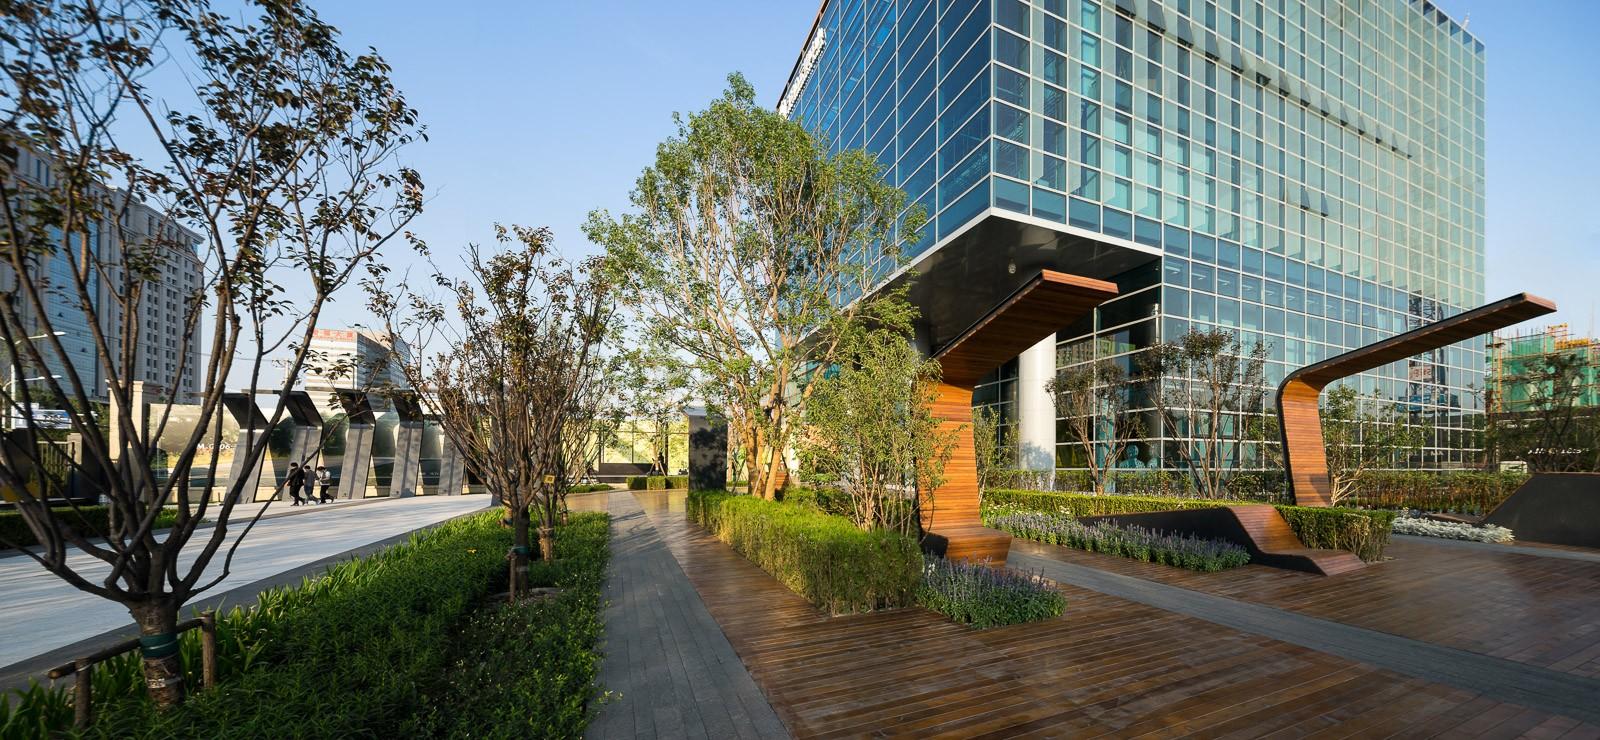 Technology Business District Green Design Landscape Architecture Blog